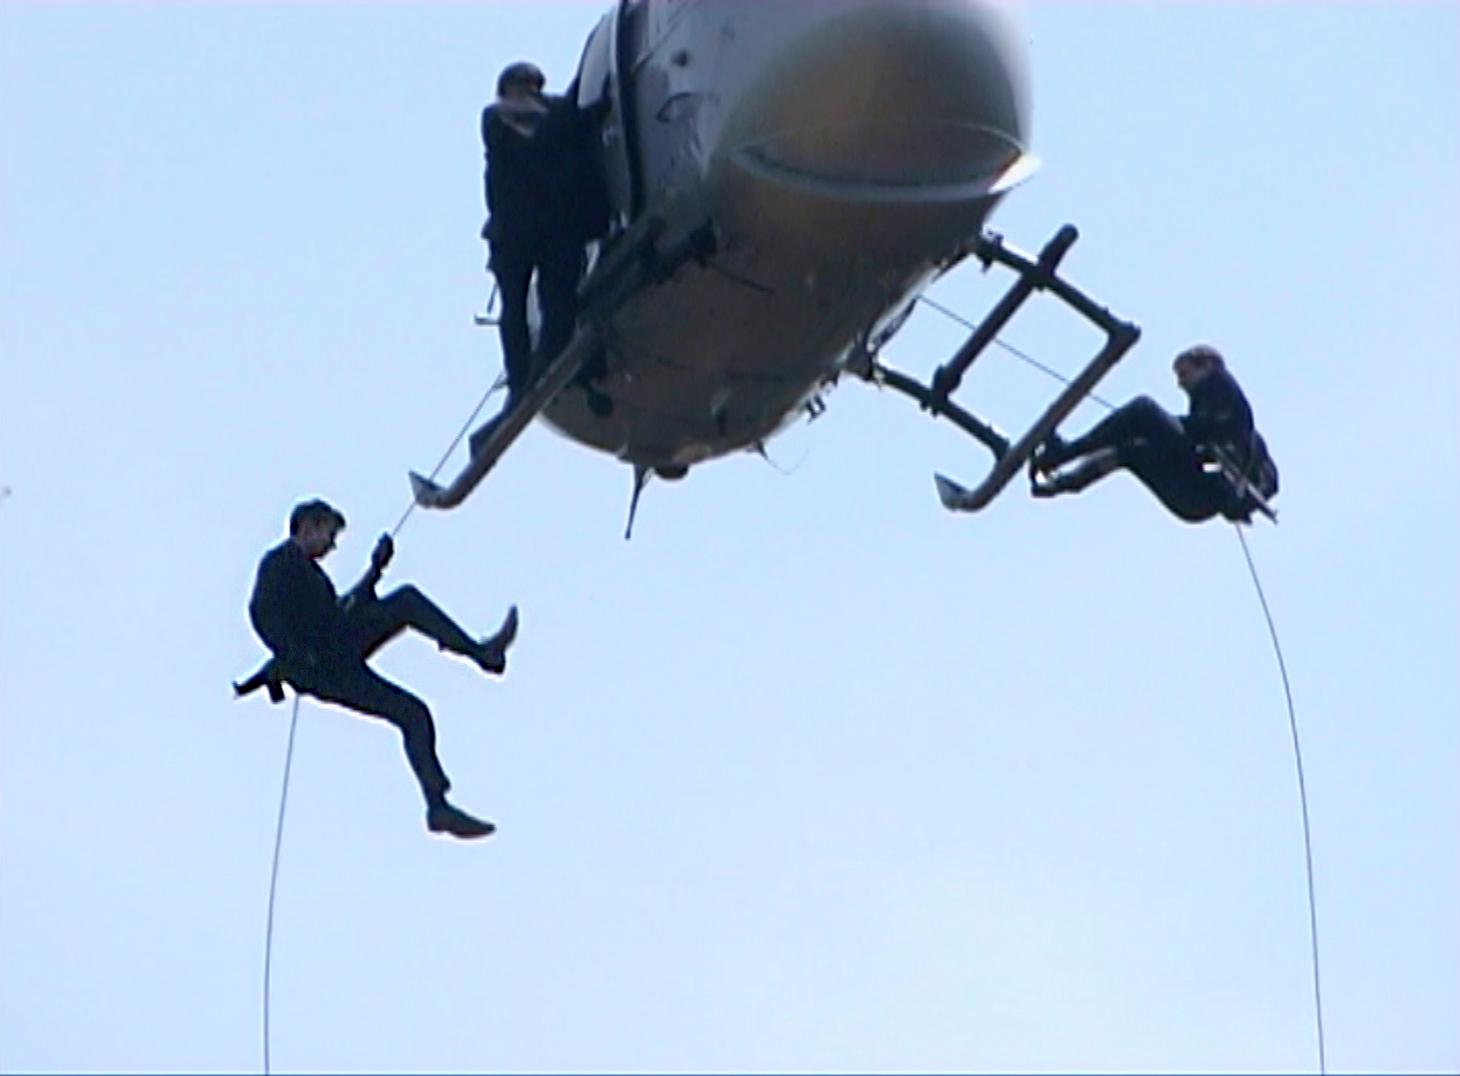 MG Action, Martin Goeres, Action design, Film Produktion, Stuntproduktion, abseilen,